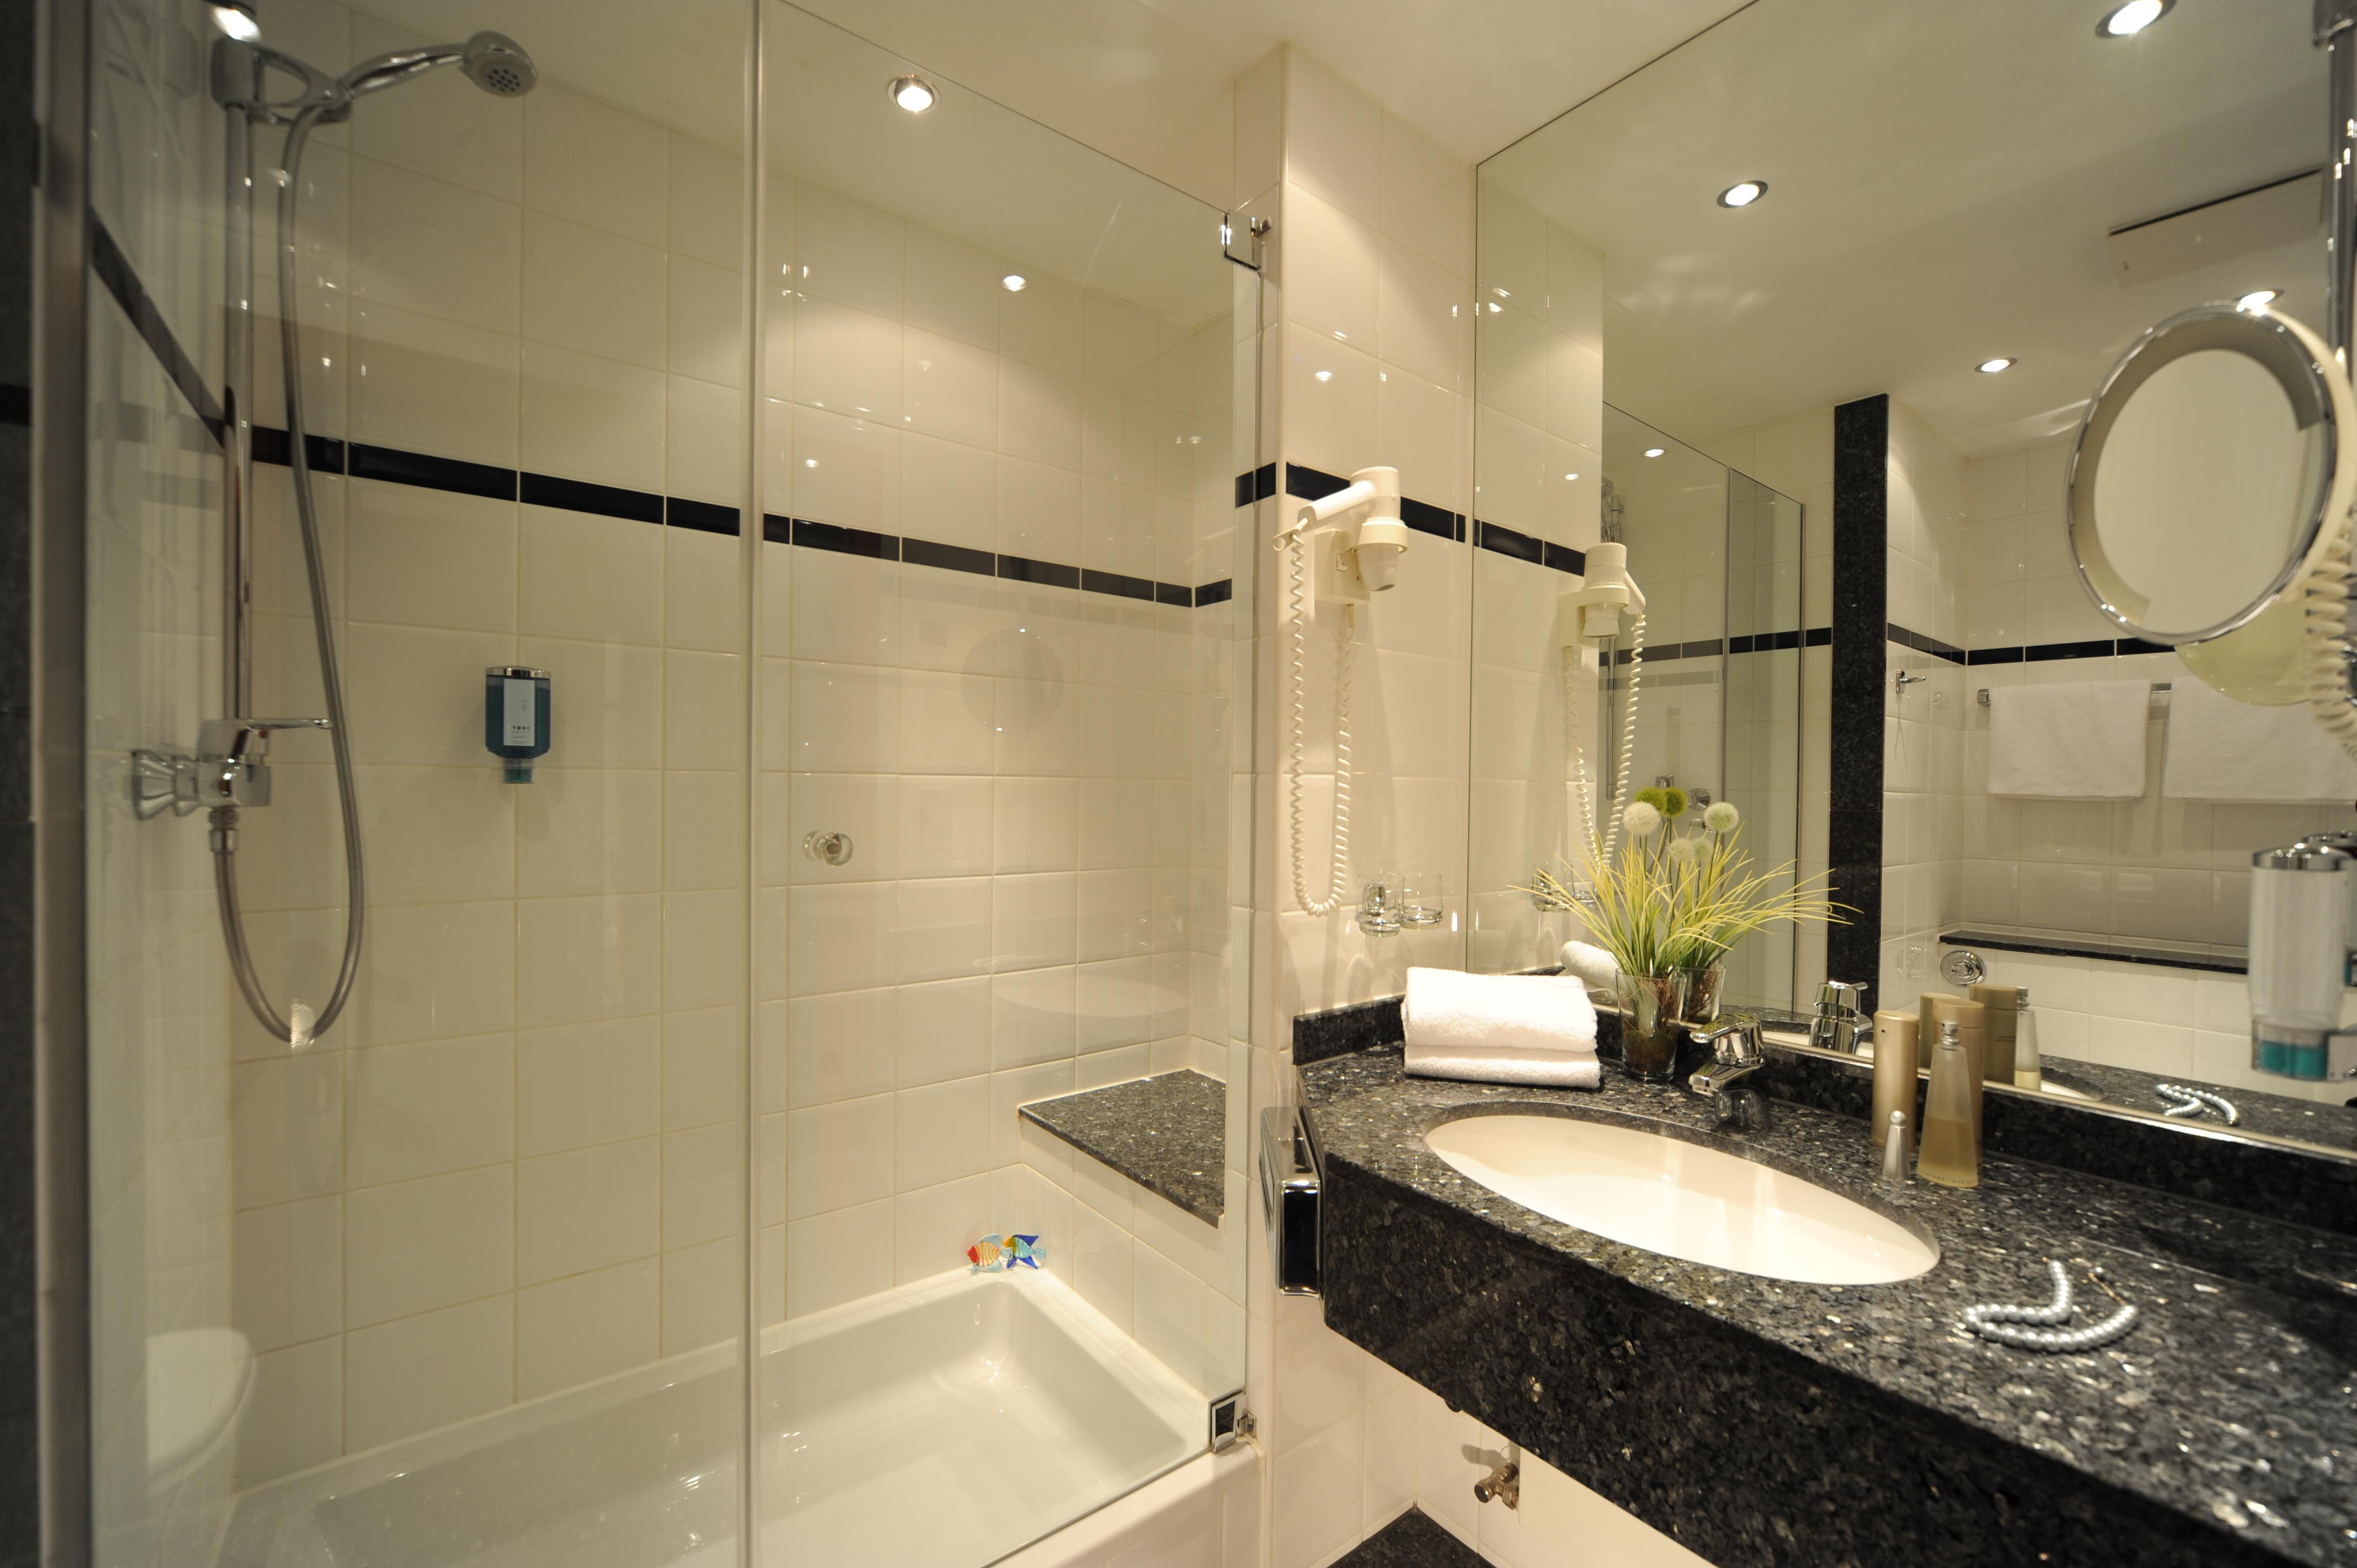 hotel m ggelsee berlin ruhige hotelzimmer mit see blick. Black Bedroom Furniture Sets. Home Design Ideas